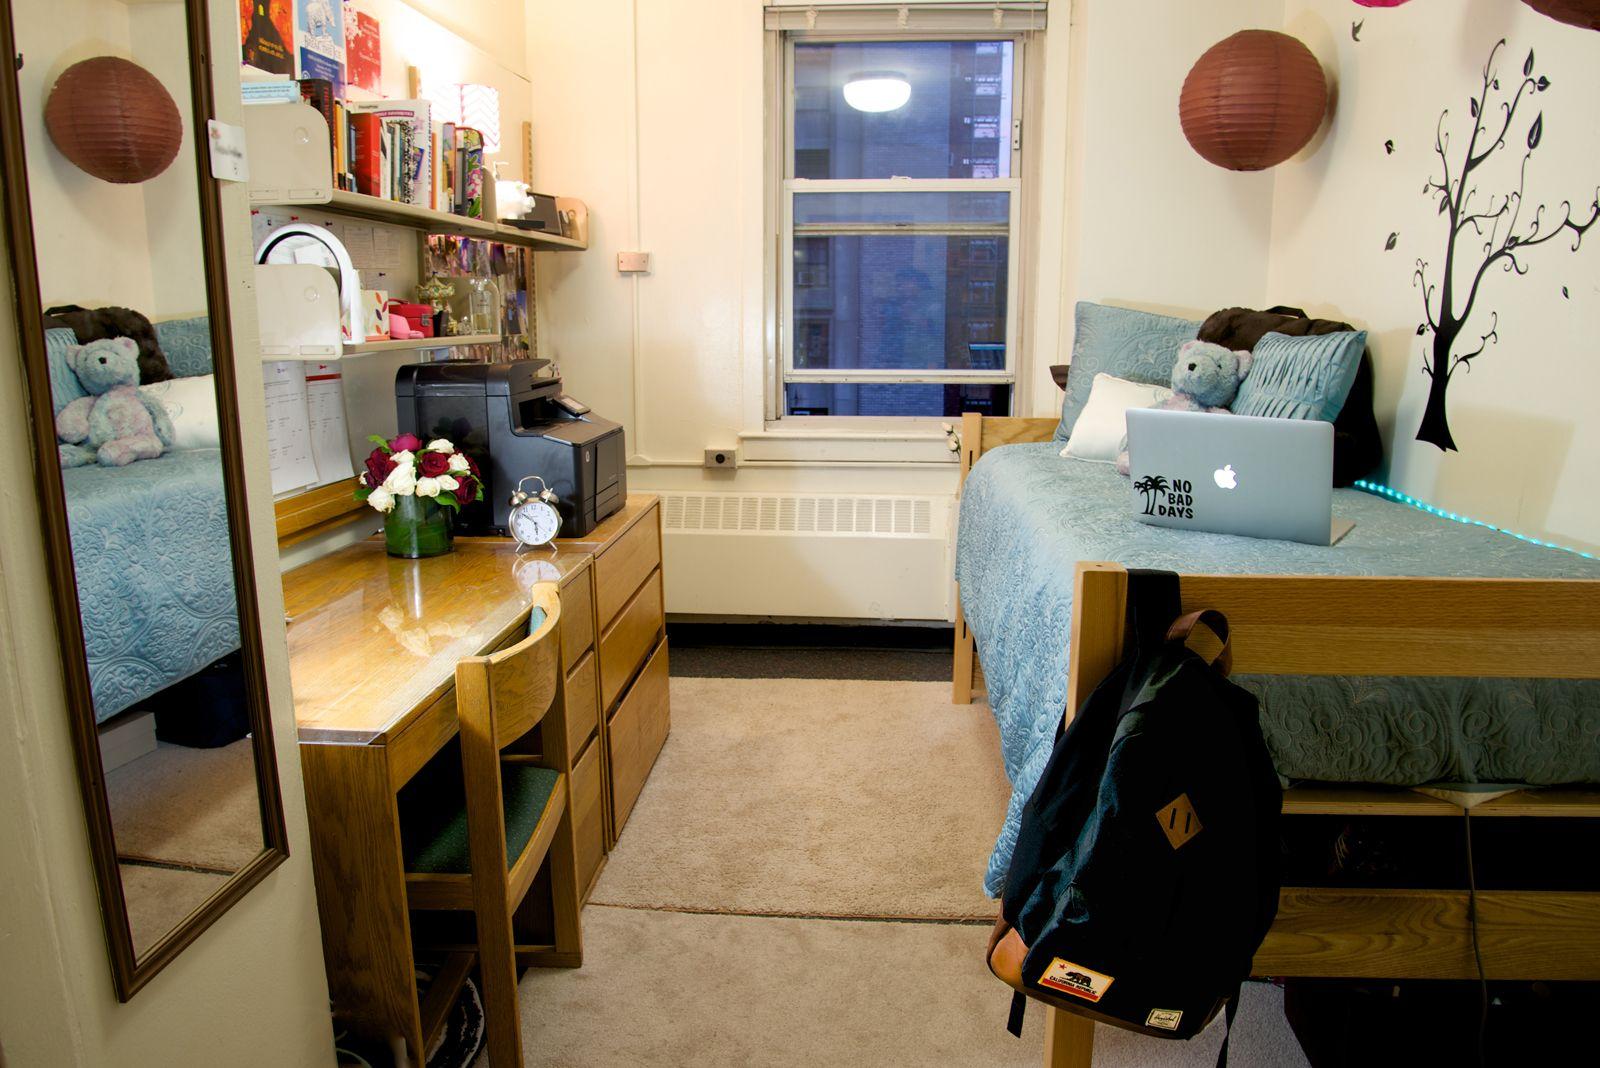 John Jay Hall Housing University Rooms University Dorms College Dorm Room Hacks